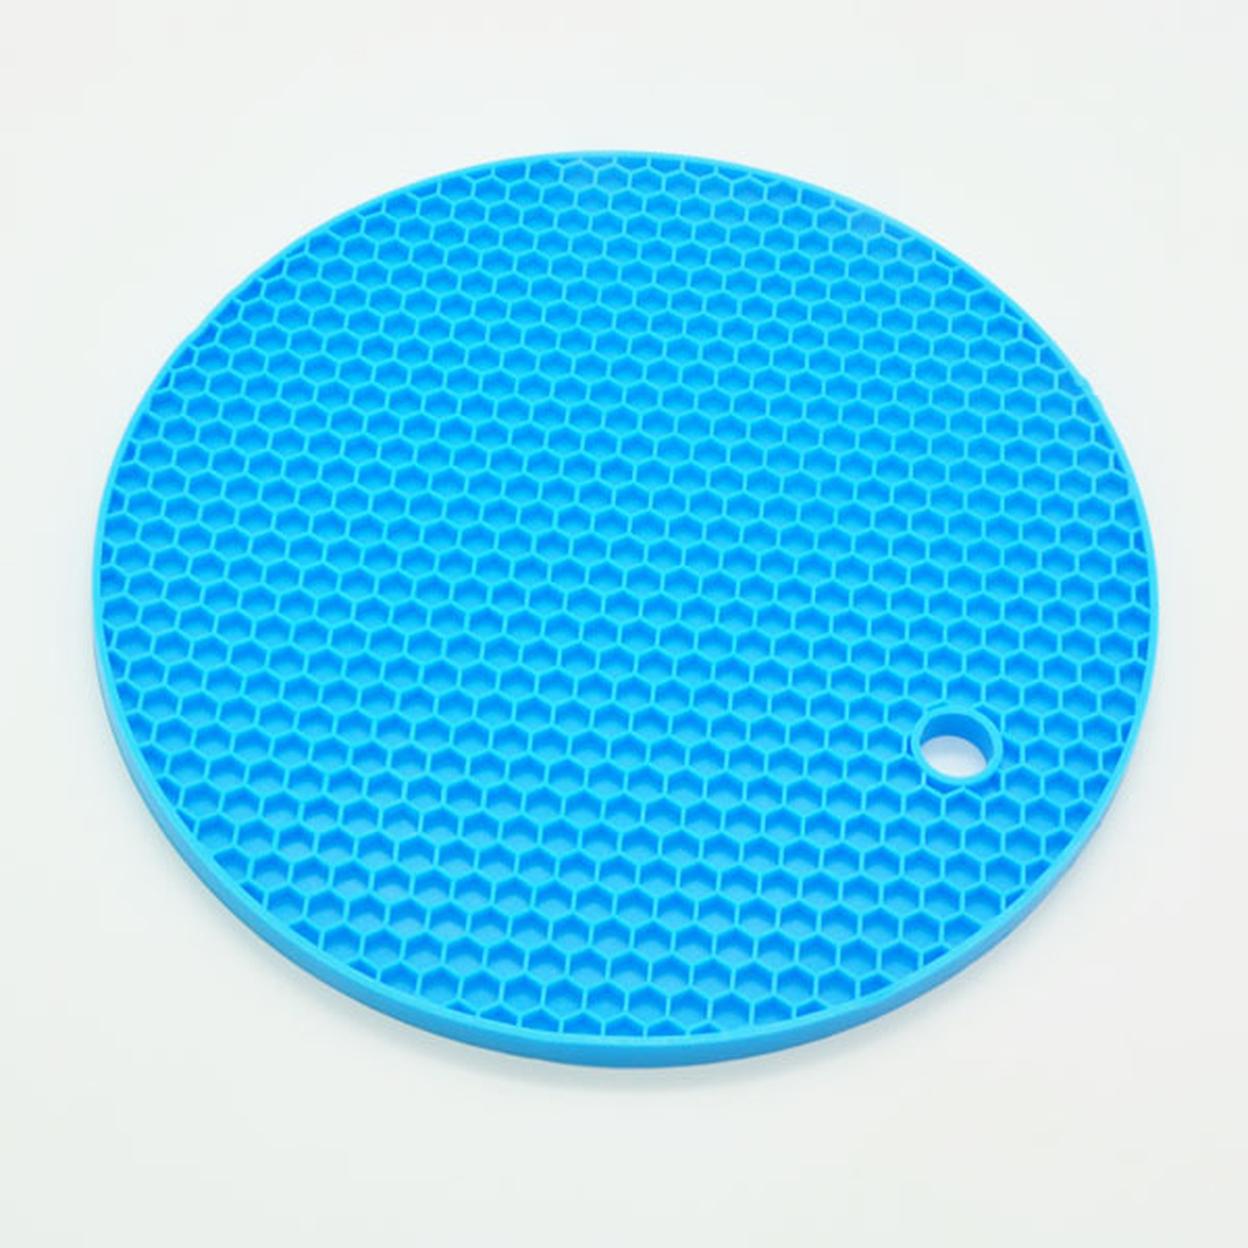 18cm Round Silicone Non-slip Heat Resistant Mat Coaster Cushion Placemat Pot Holder Kitchen Accessories - Blue 5997d9dc40f76c222b0e8436